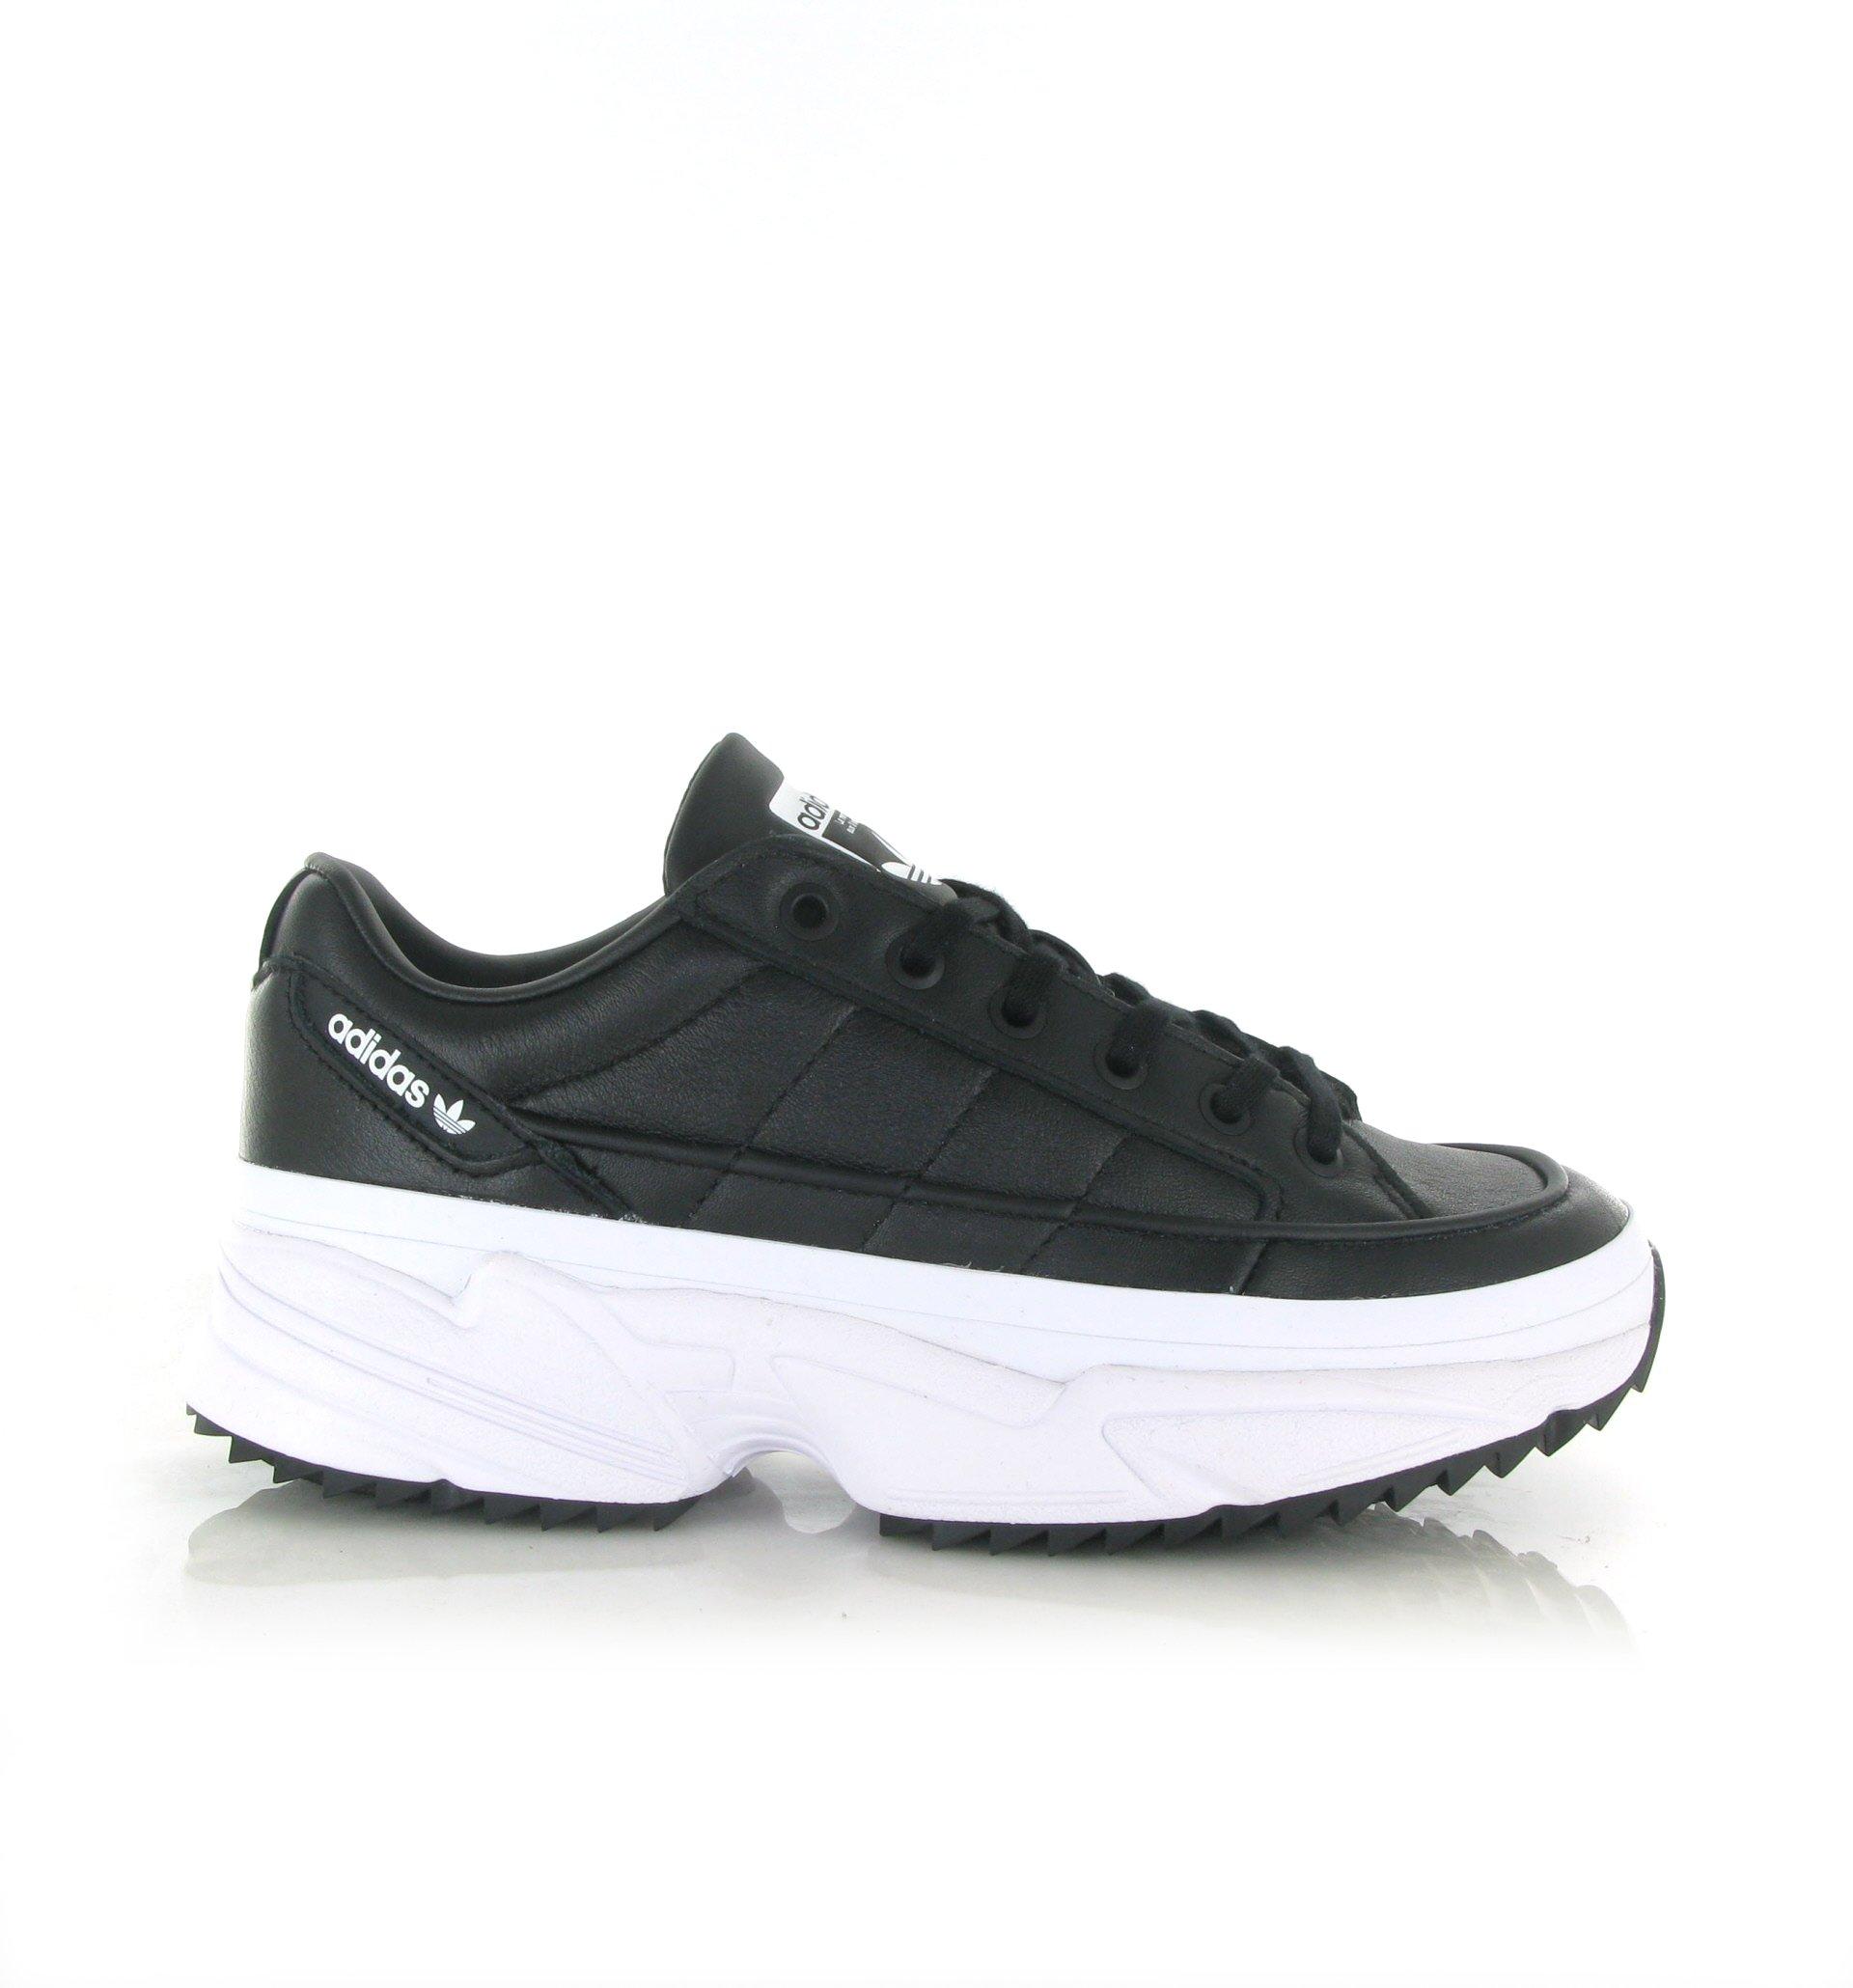 Adidas KIELLOR W Zwart